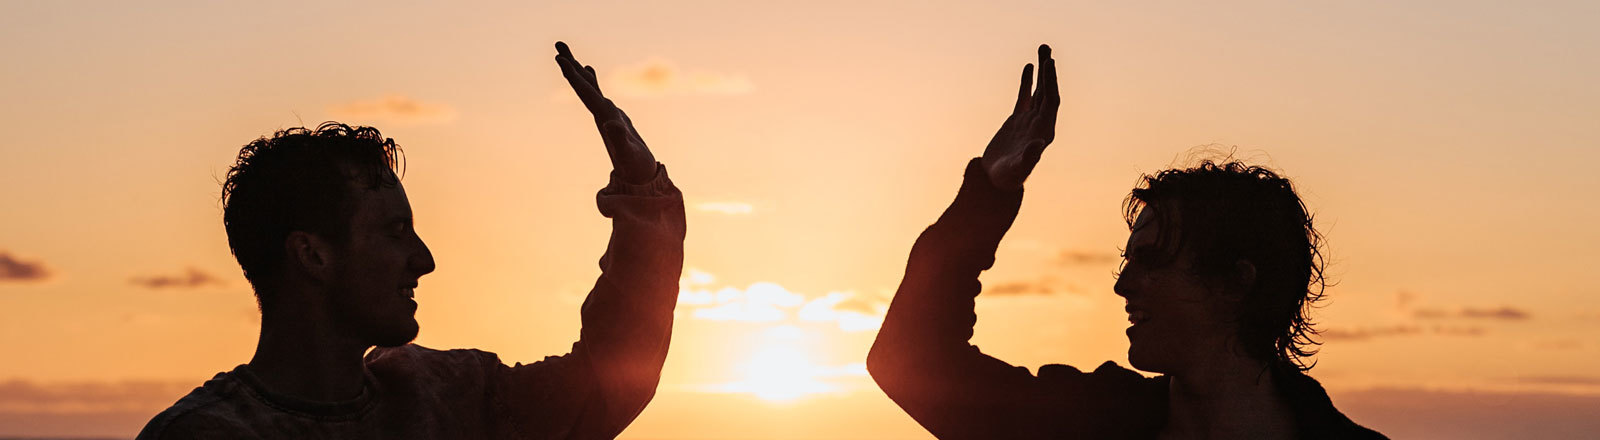 High Five im Sonnenuntergang